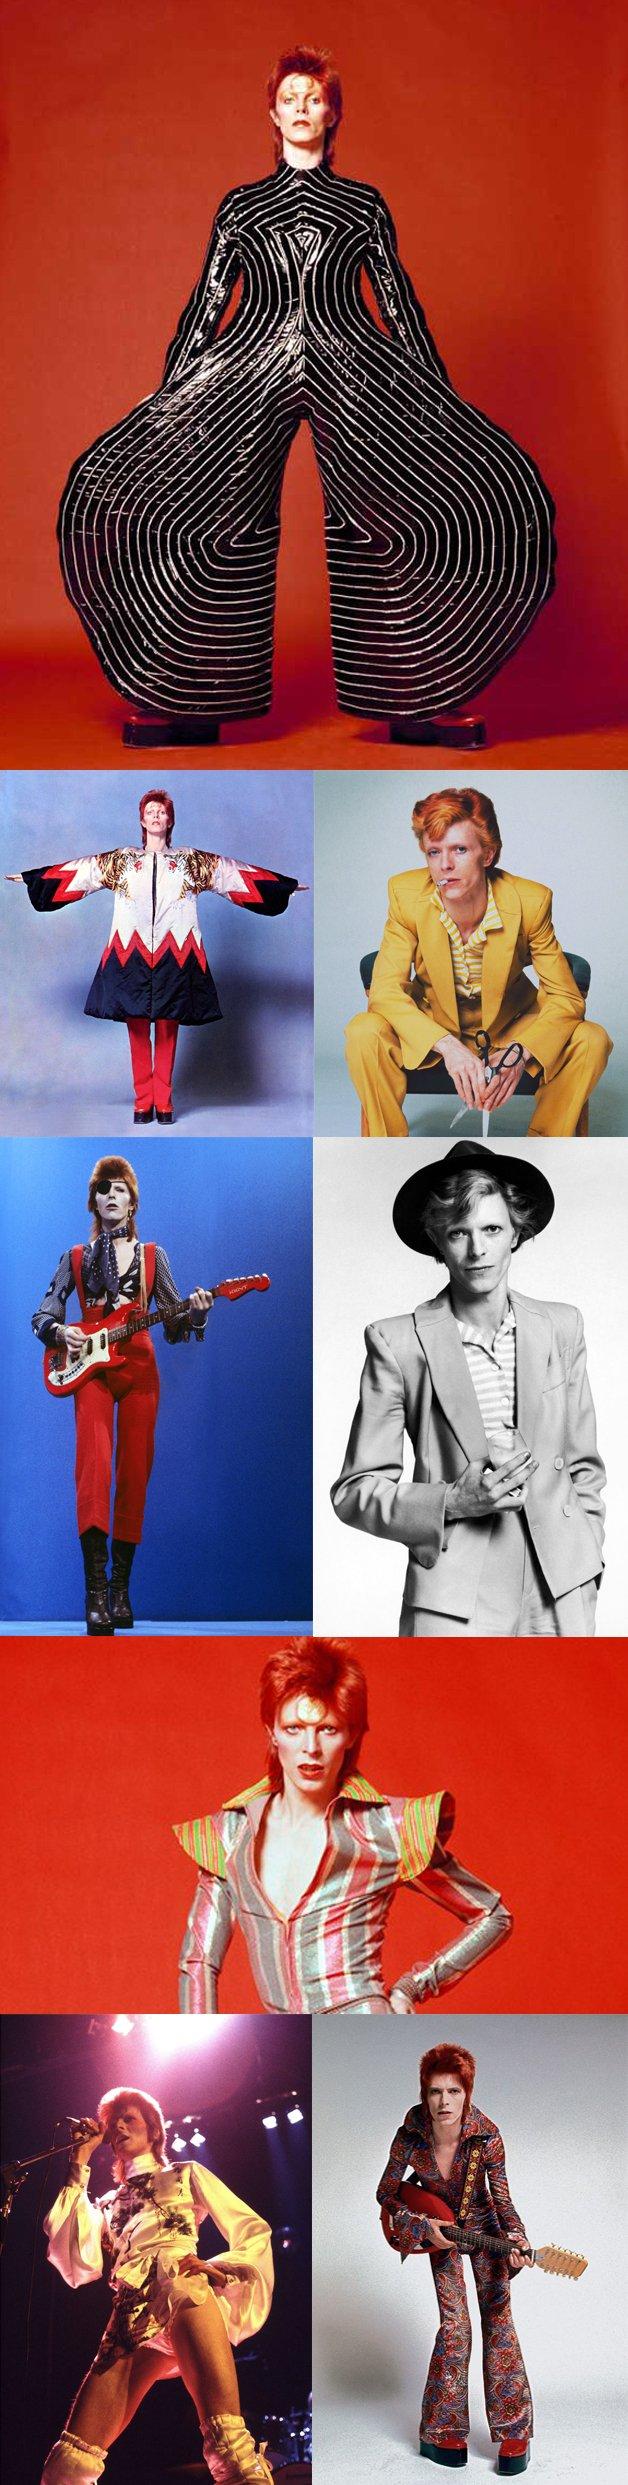 Exemplos do impacto de Bowie sobre o mundo da moda